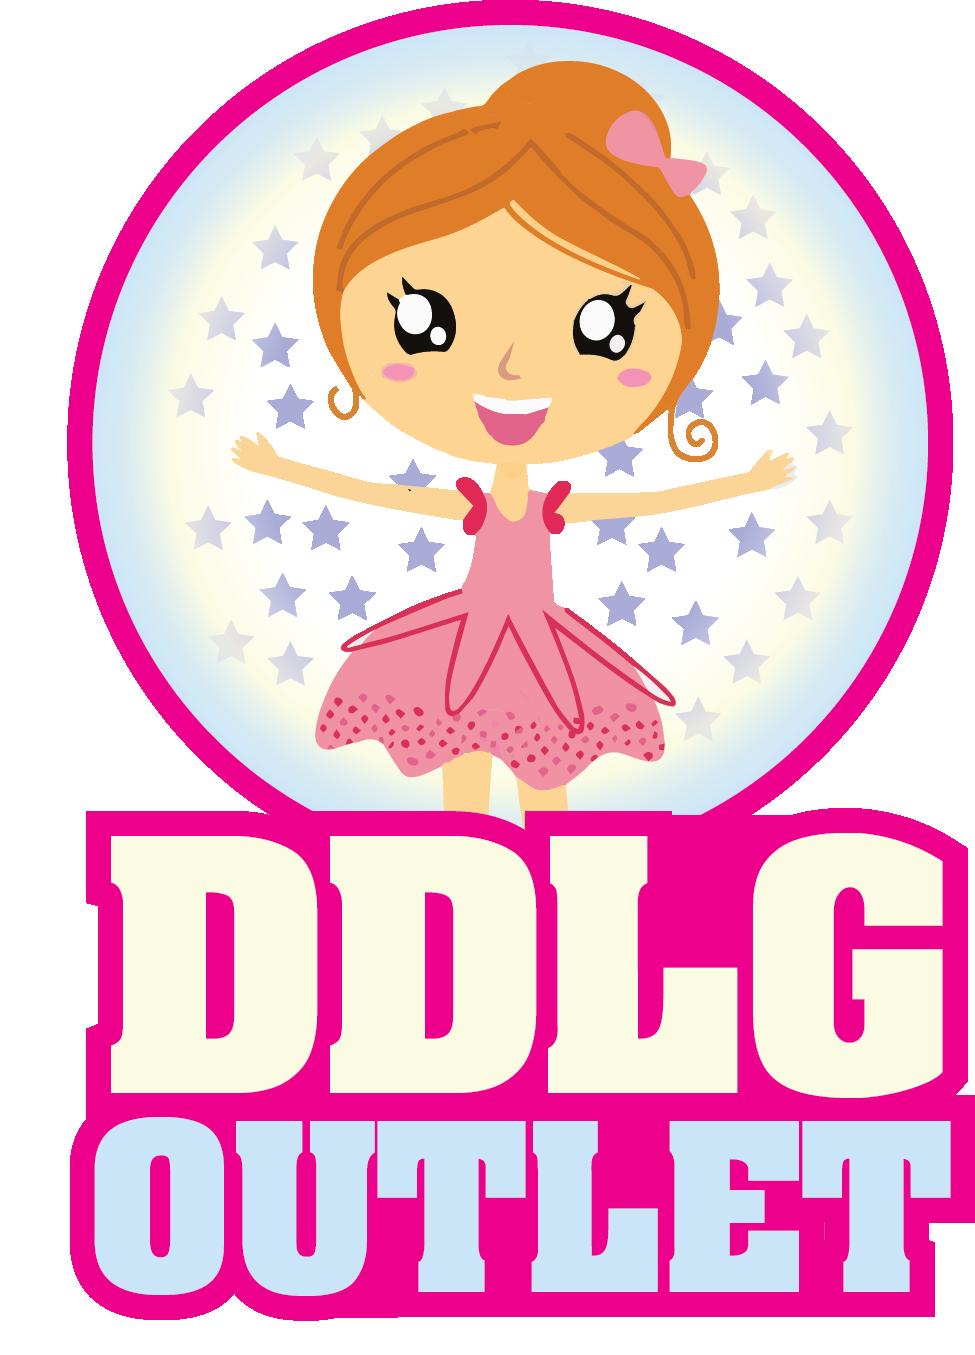 DDLG Outlet